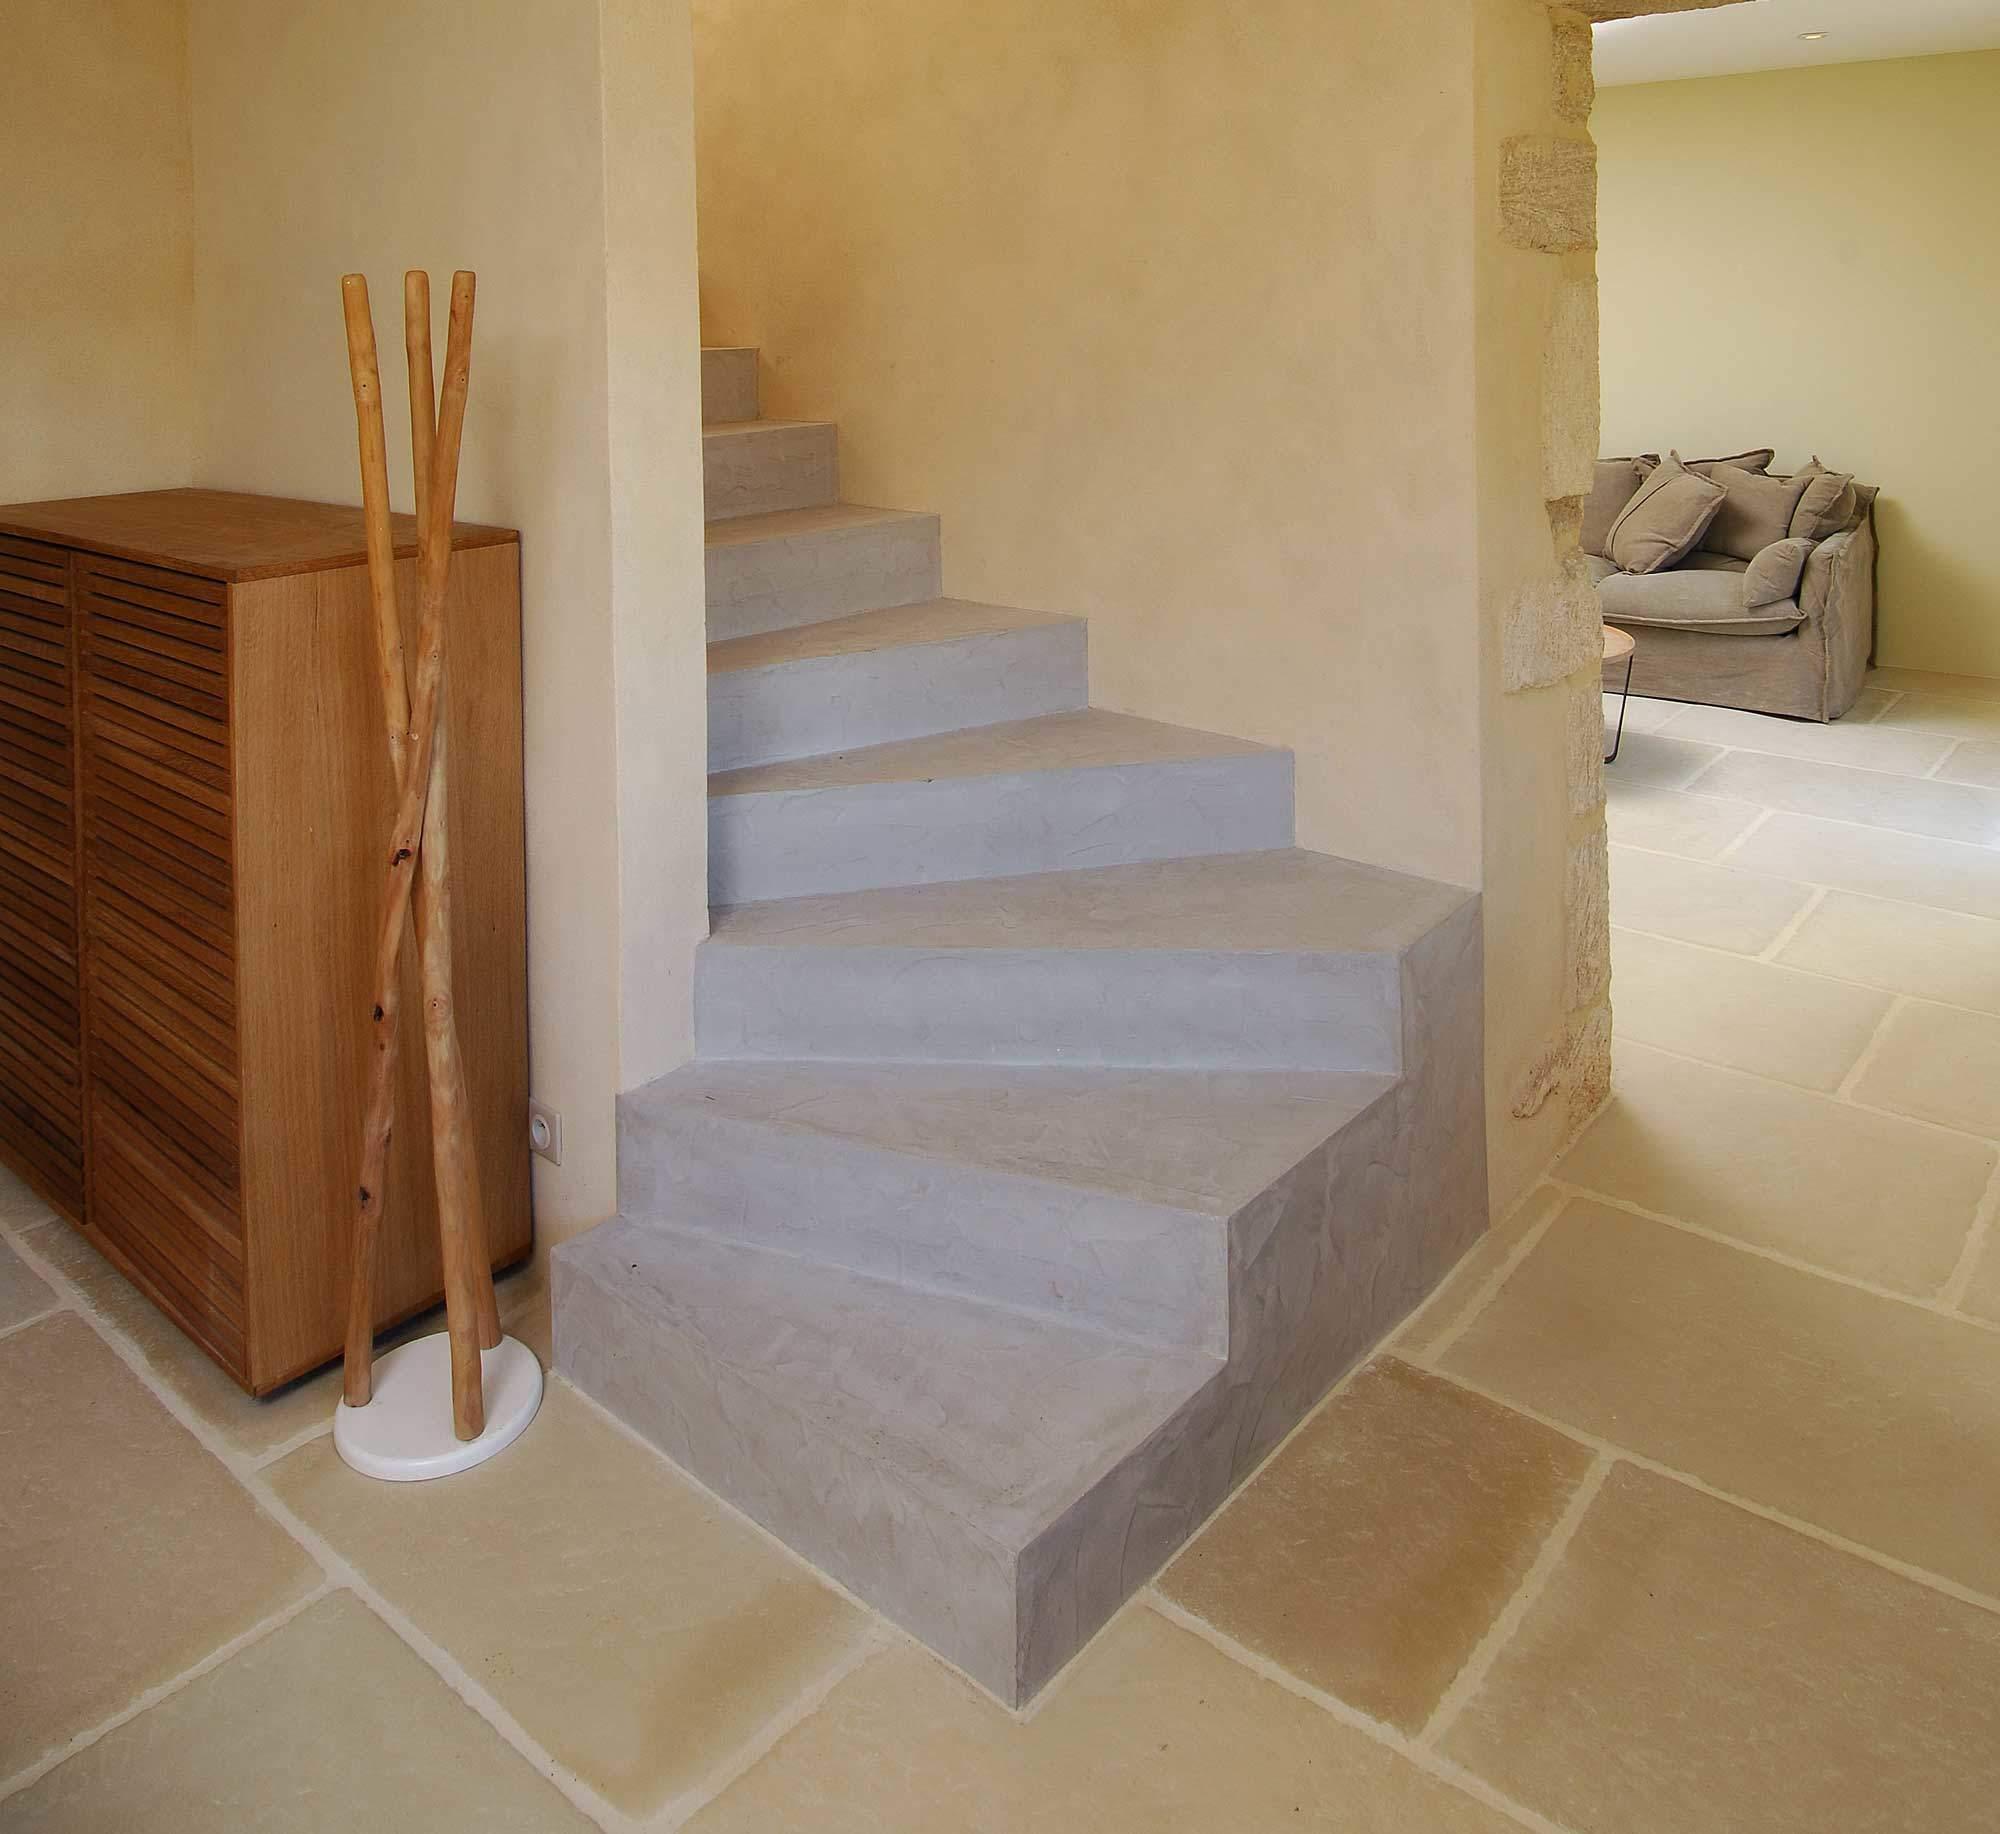 Rev tement escalier fa on b ton cir par rouviere collection for Construction escalier beton interieur